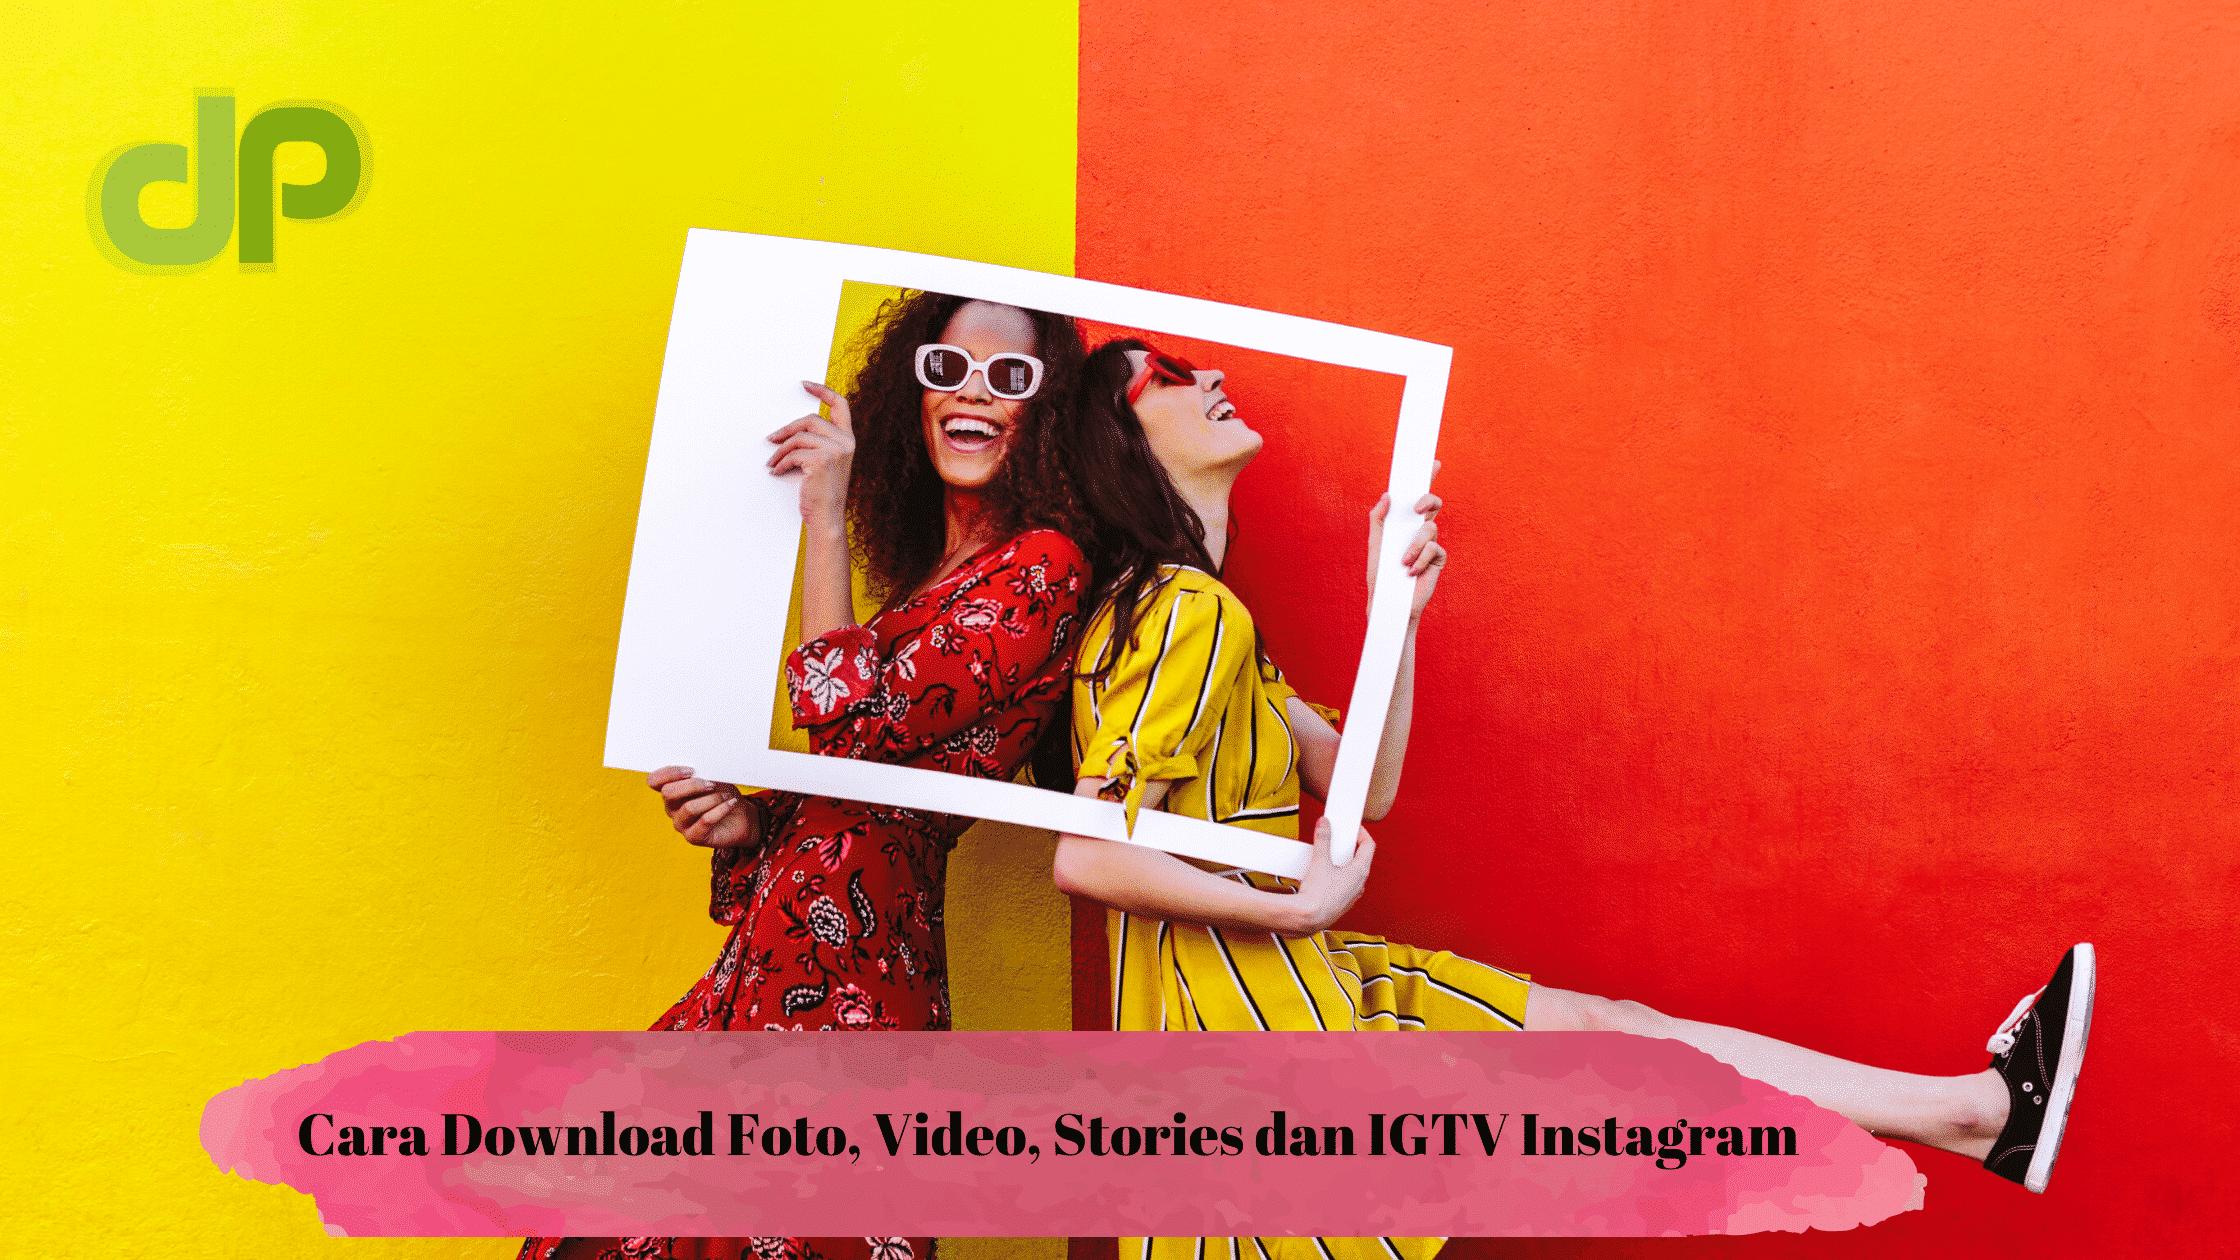 Cara Downlaod Foto, Video, Stories dan IGTV Instagram